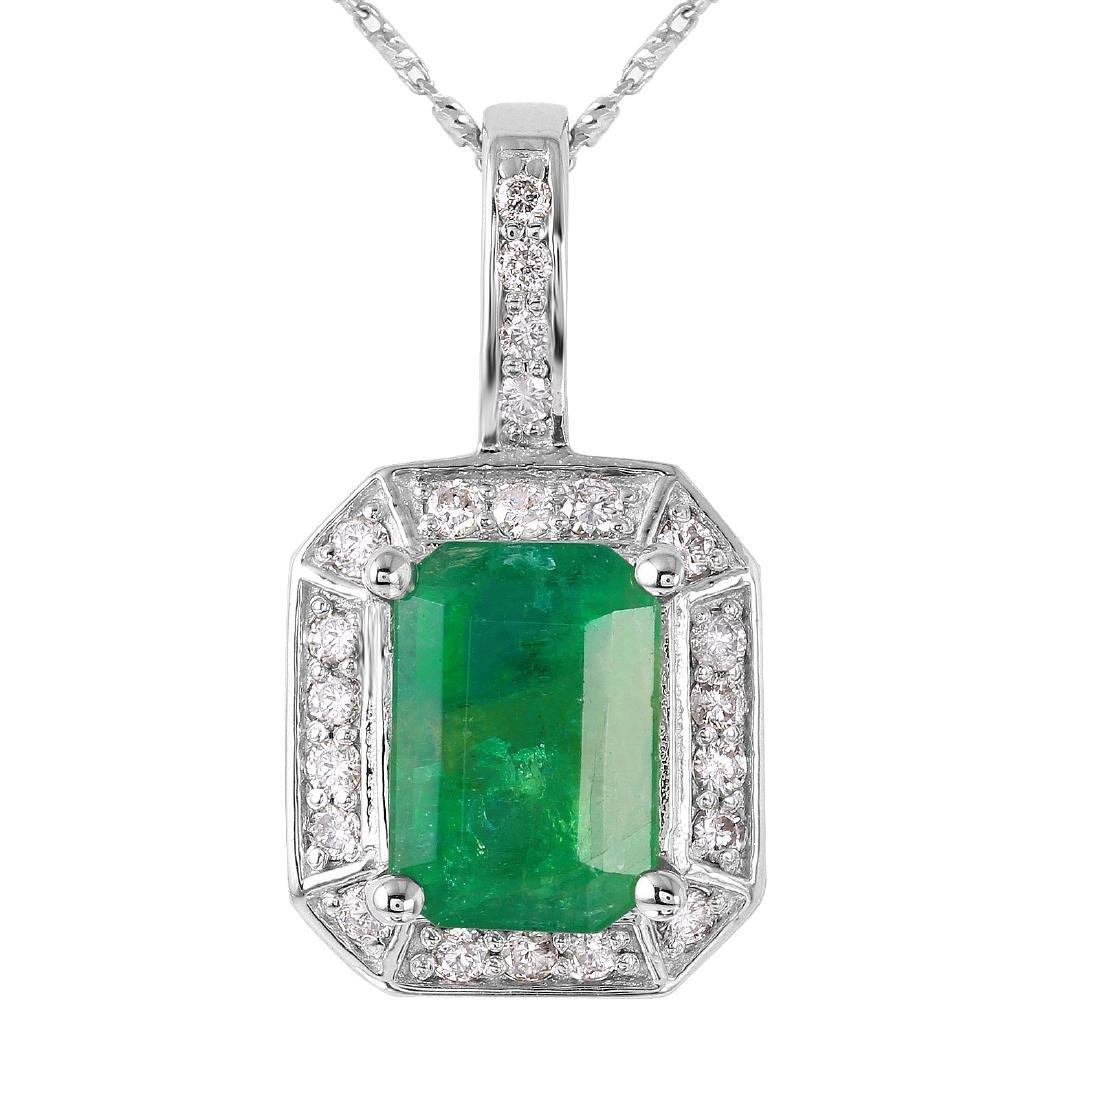 14KT White Gold Emerald & Diamond Necklace